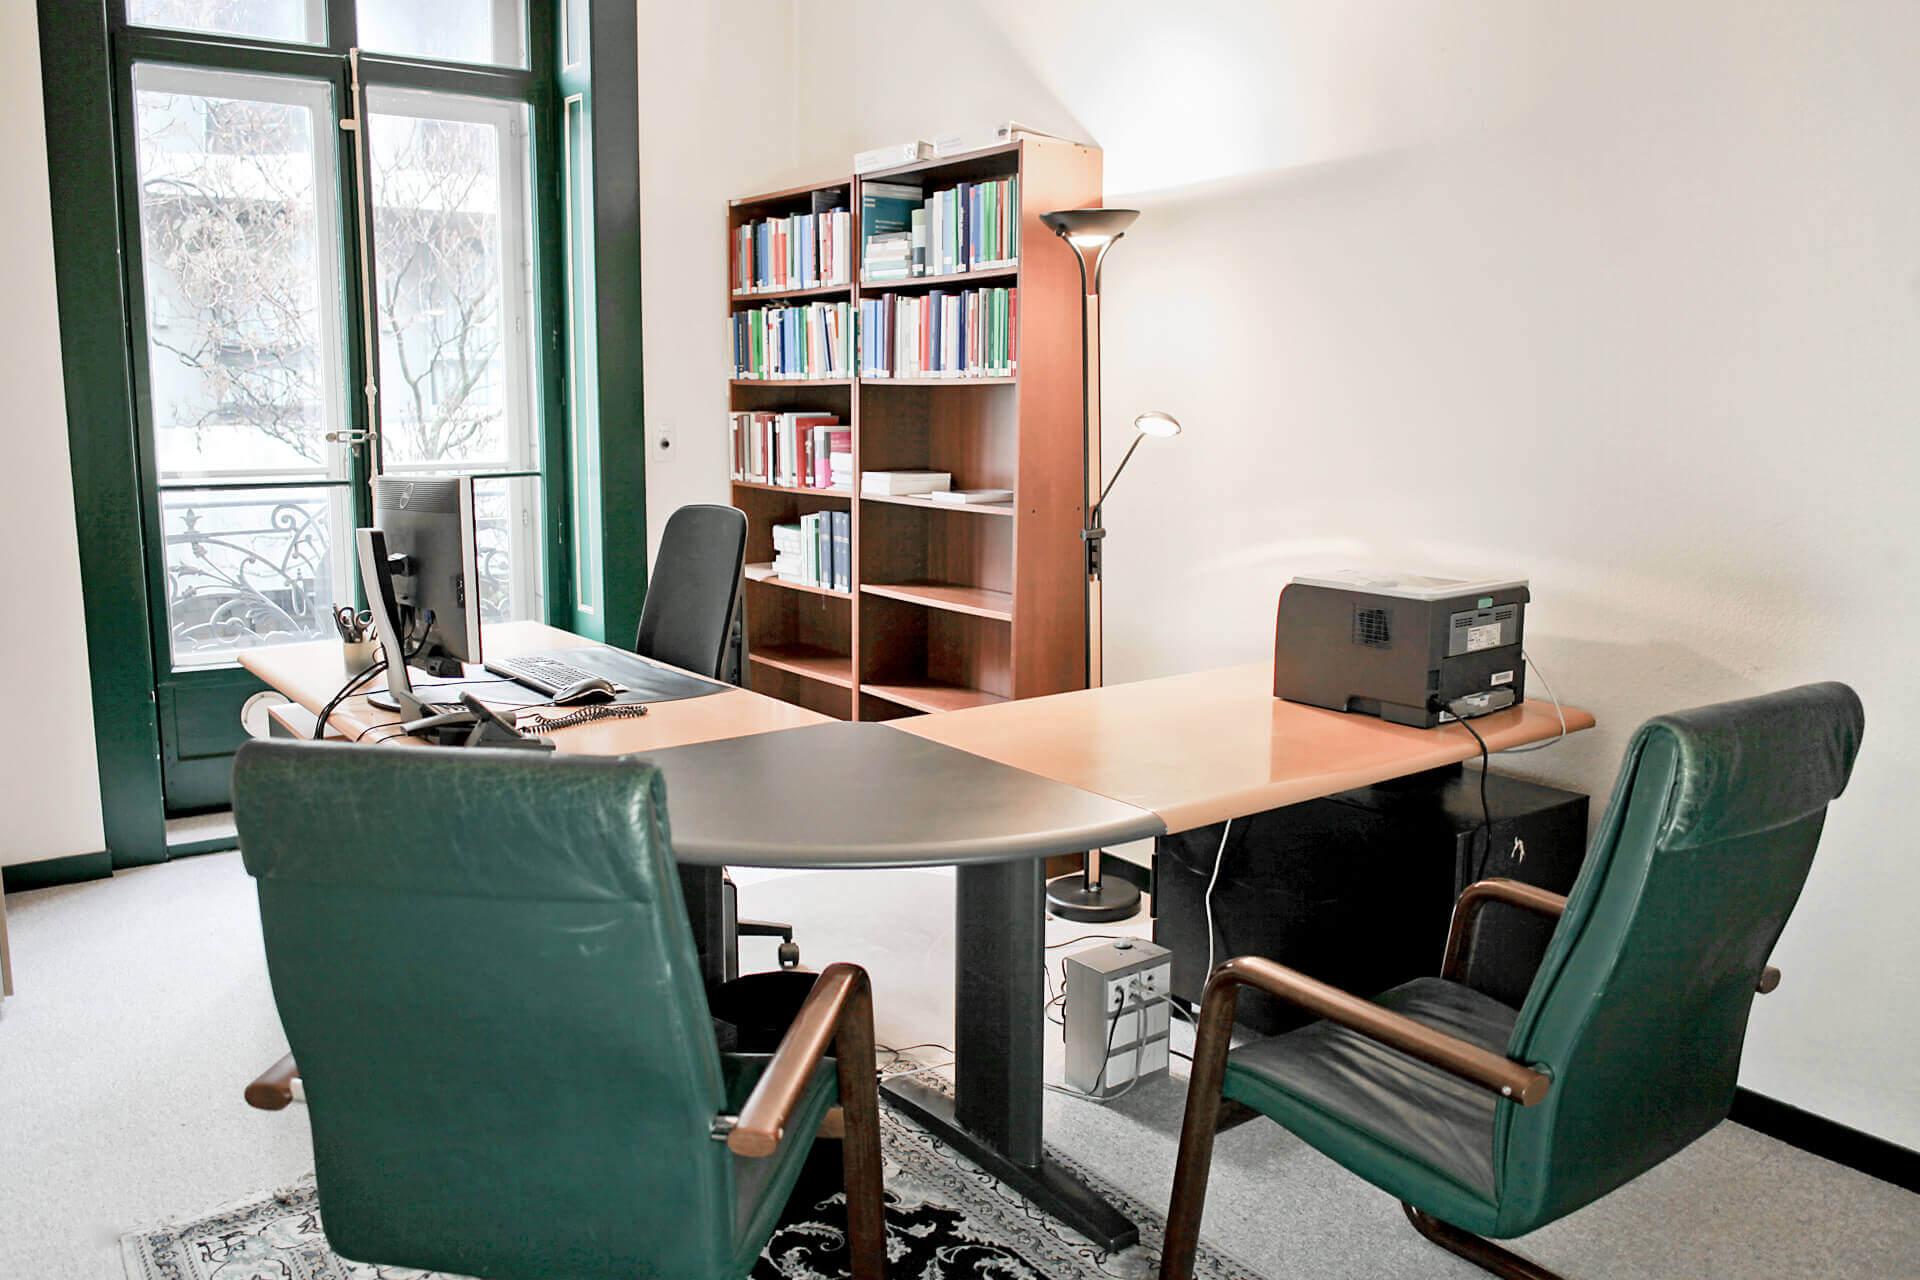 lawffice plateforme de coworking r serv e aux avocats. Black Bedroom Furniture Sets. Home Design Ideas